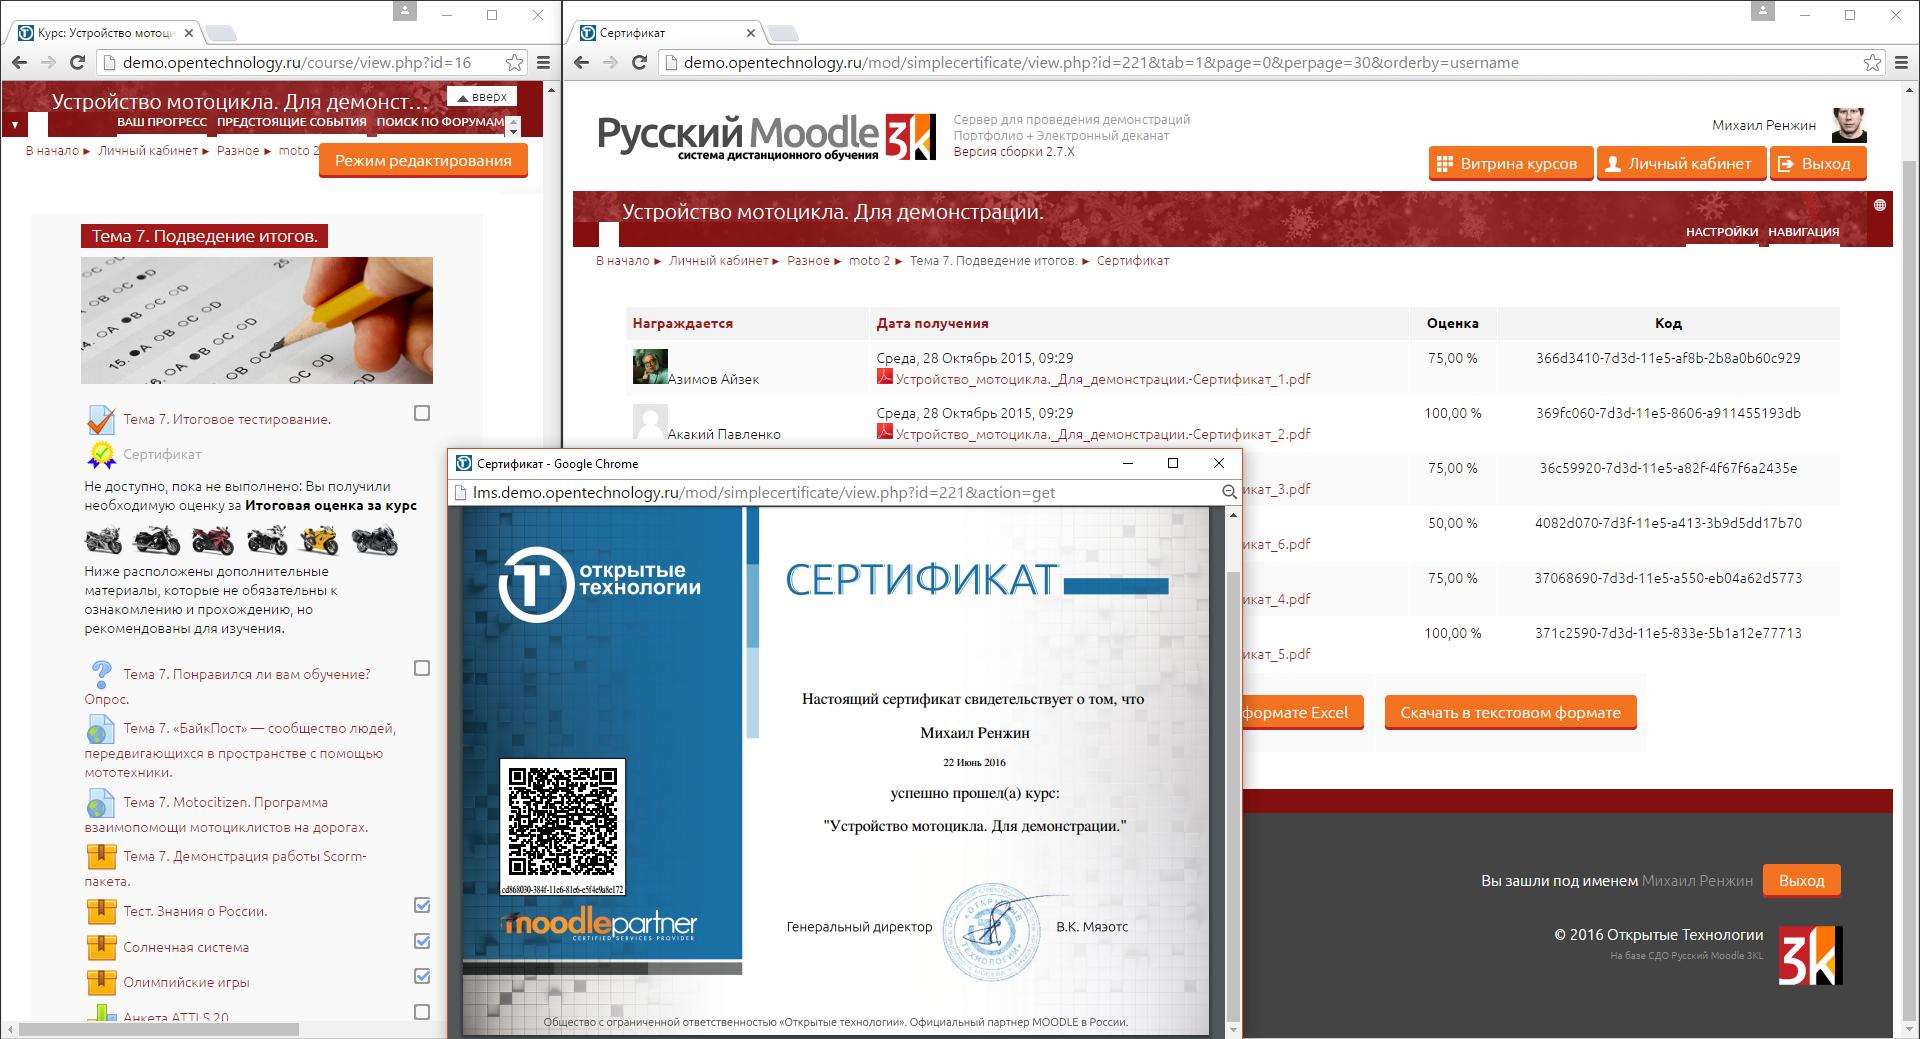 ФИШКА 5. Электронные сертификаты